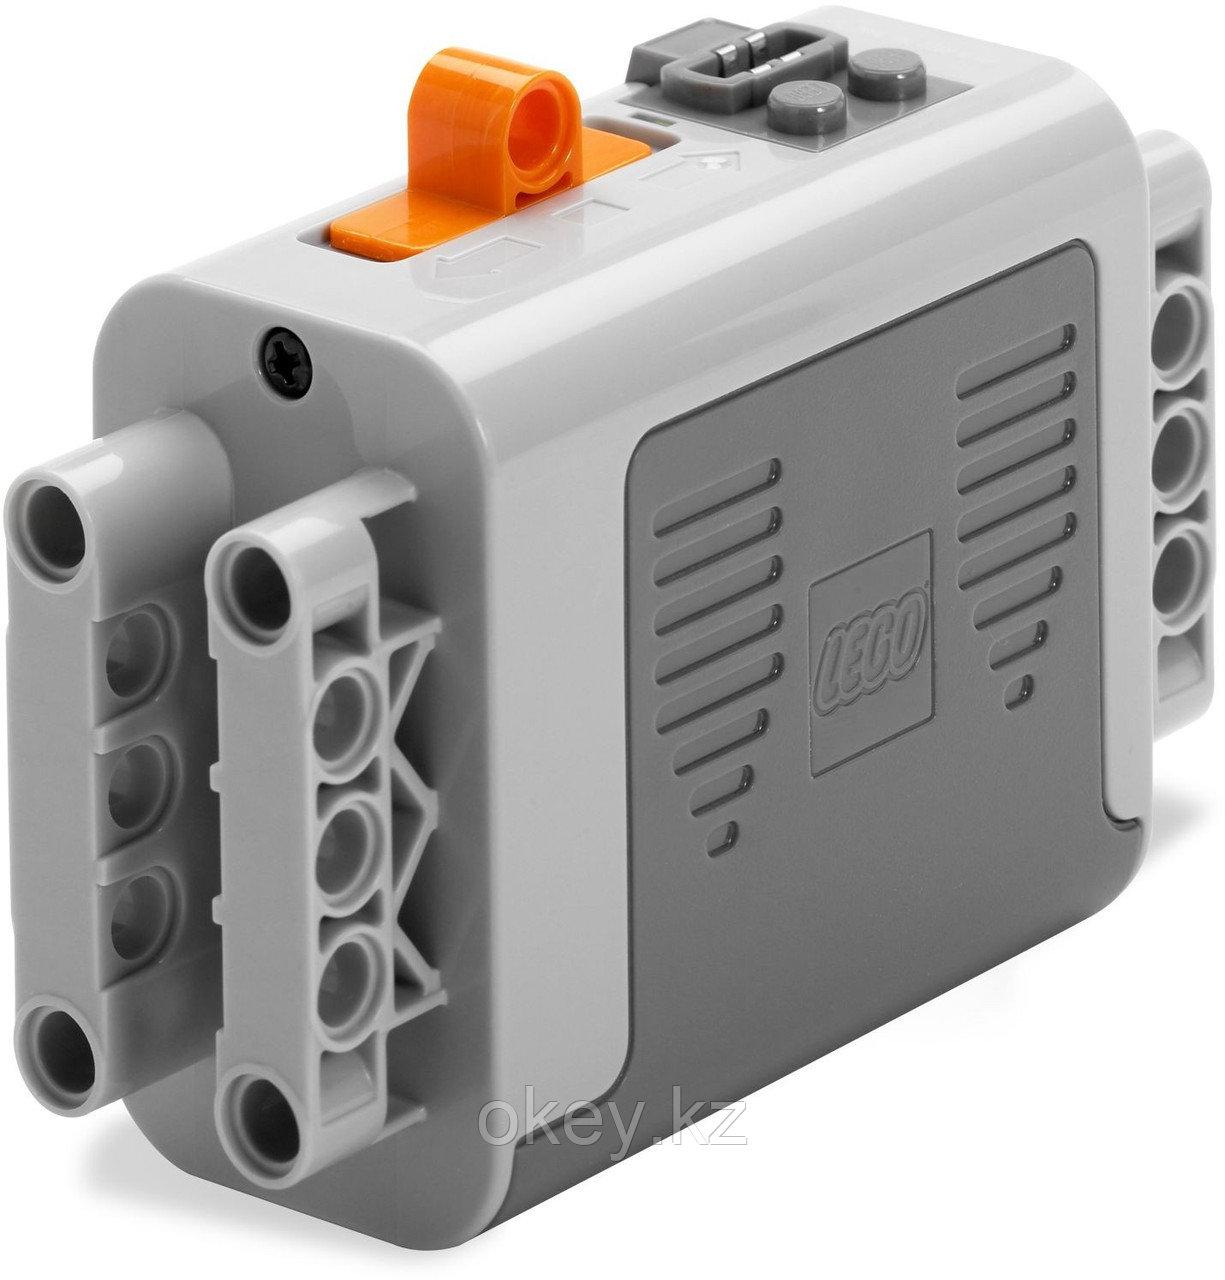 LEGO Education Mindstorms: Батарейный блок  LEGO 8881